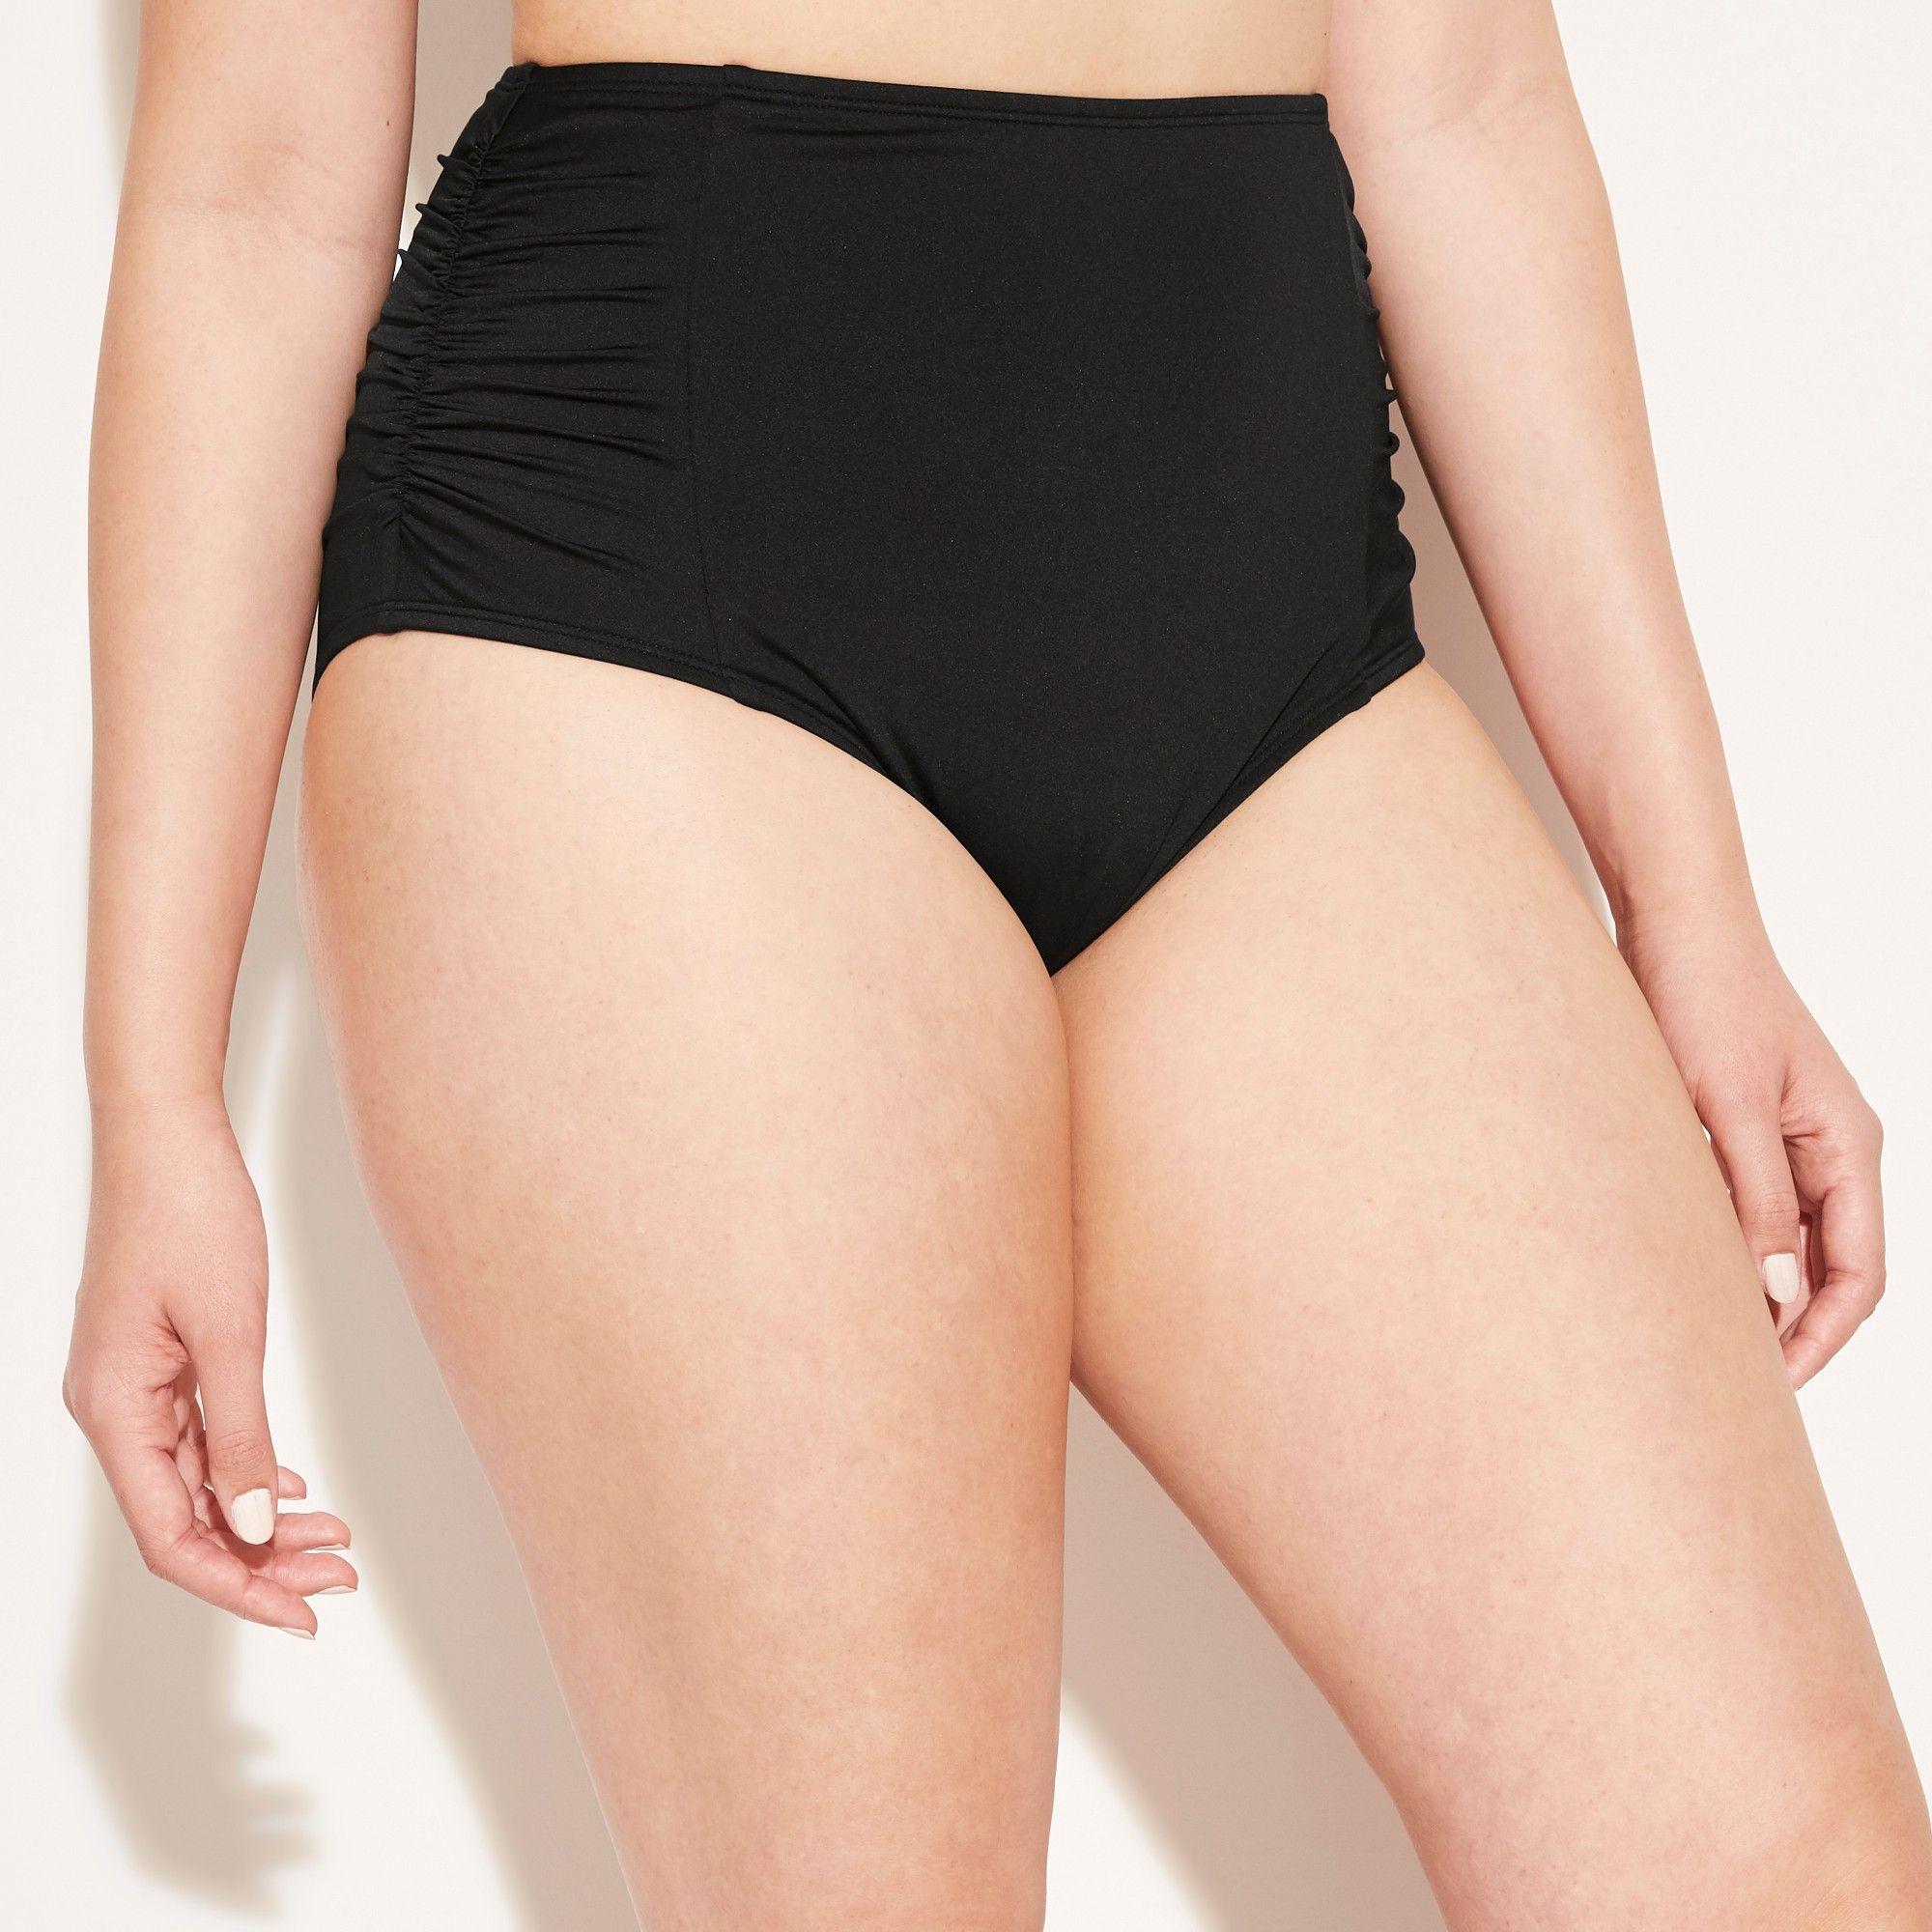 00fac38b775 Women's Full Coverage Ruched High Waist Bikini Bottom - Kona Sol Black XL,  Black Universe